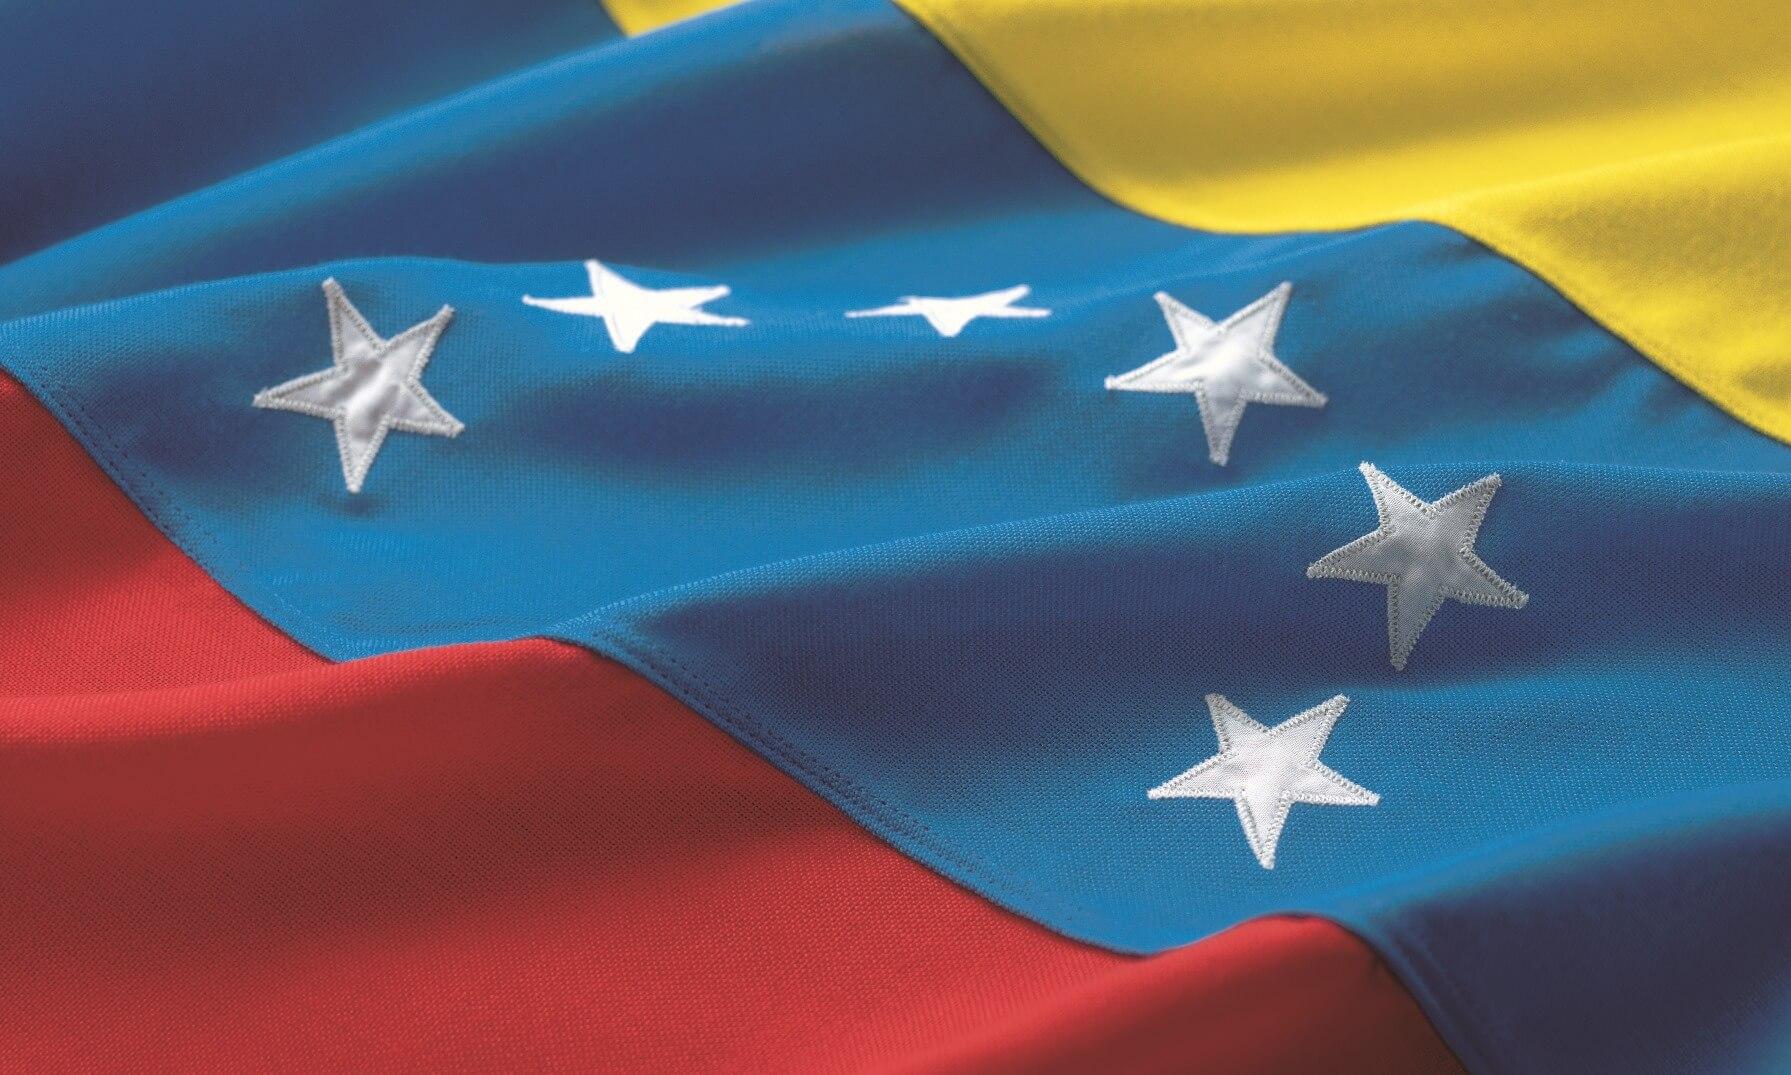 Close-up on a draped Venezuelan flag